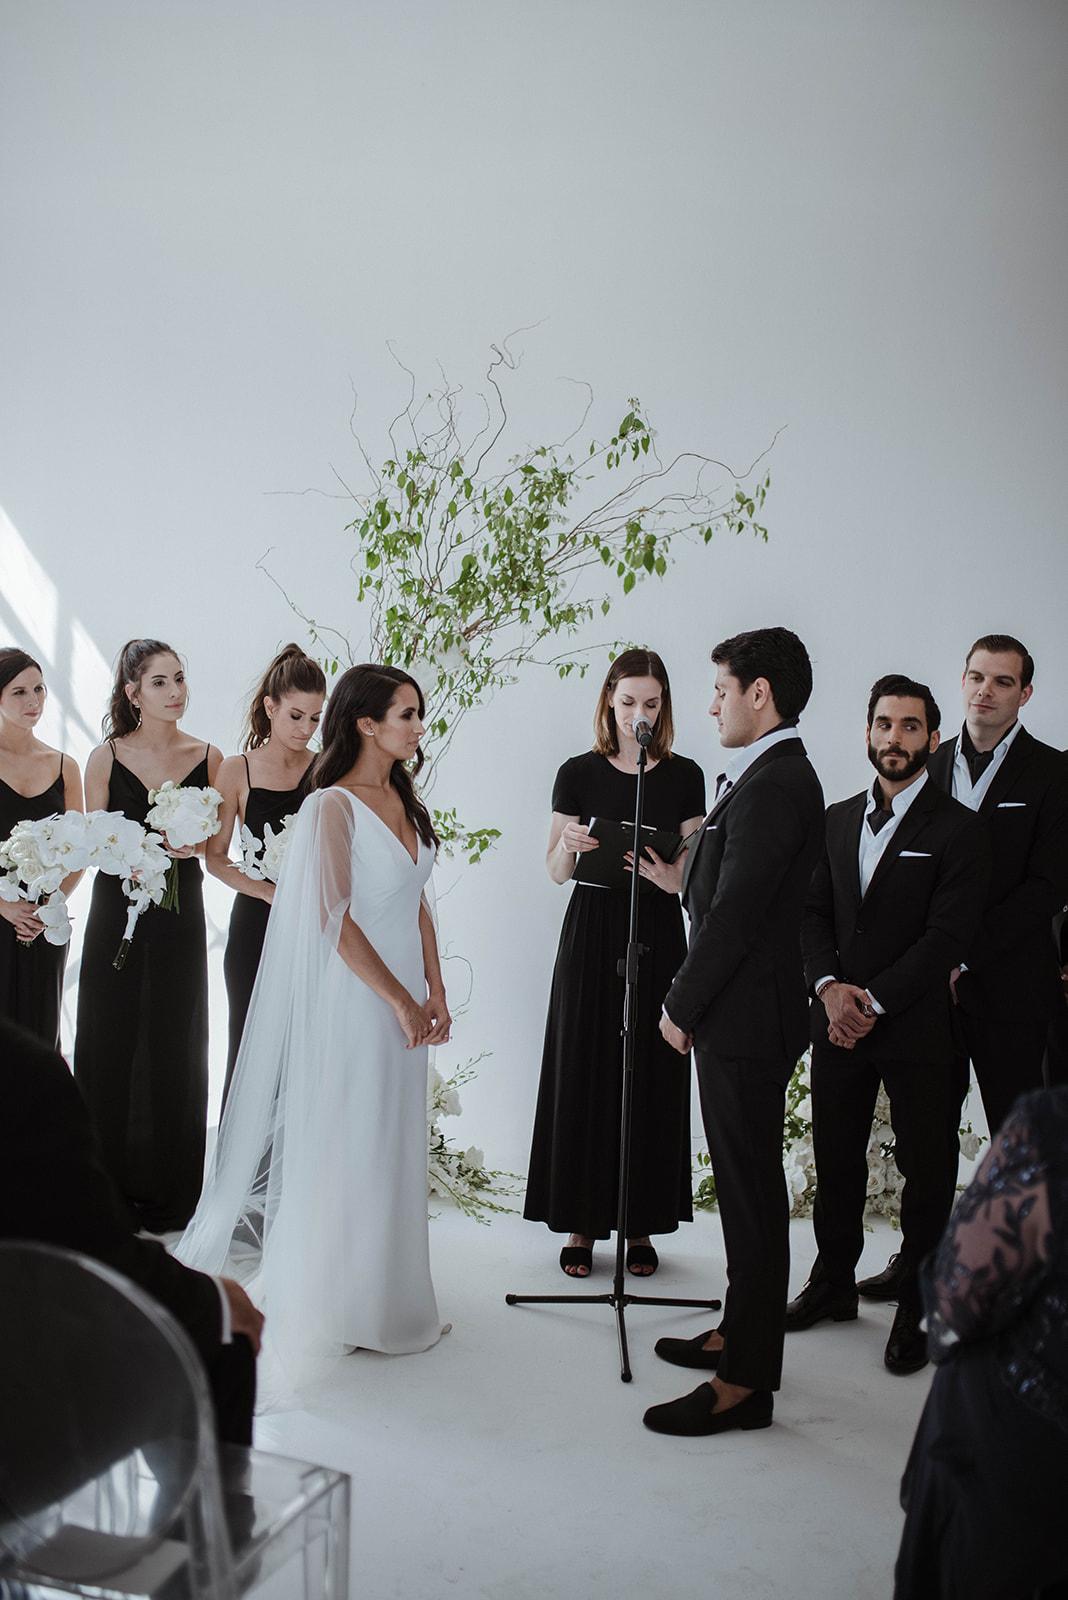 Jenna___Austin_Wedding_Day-_LHP-526.jpg